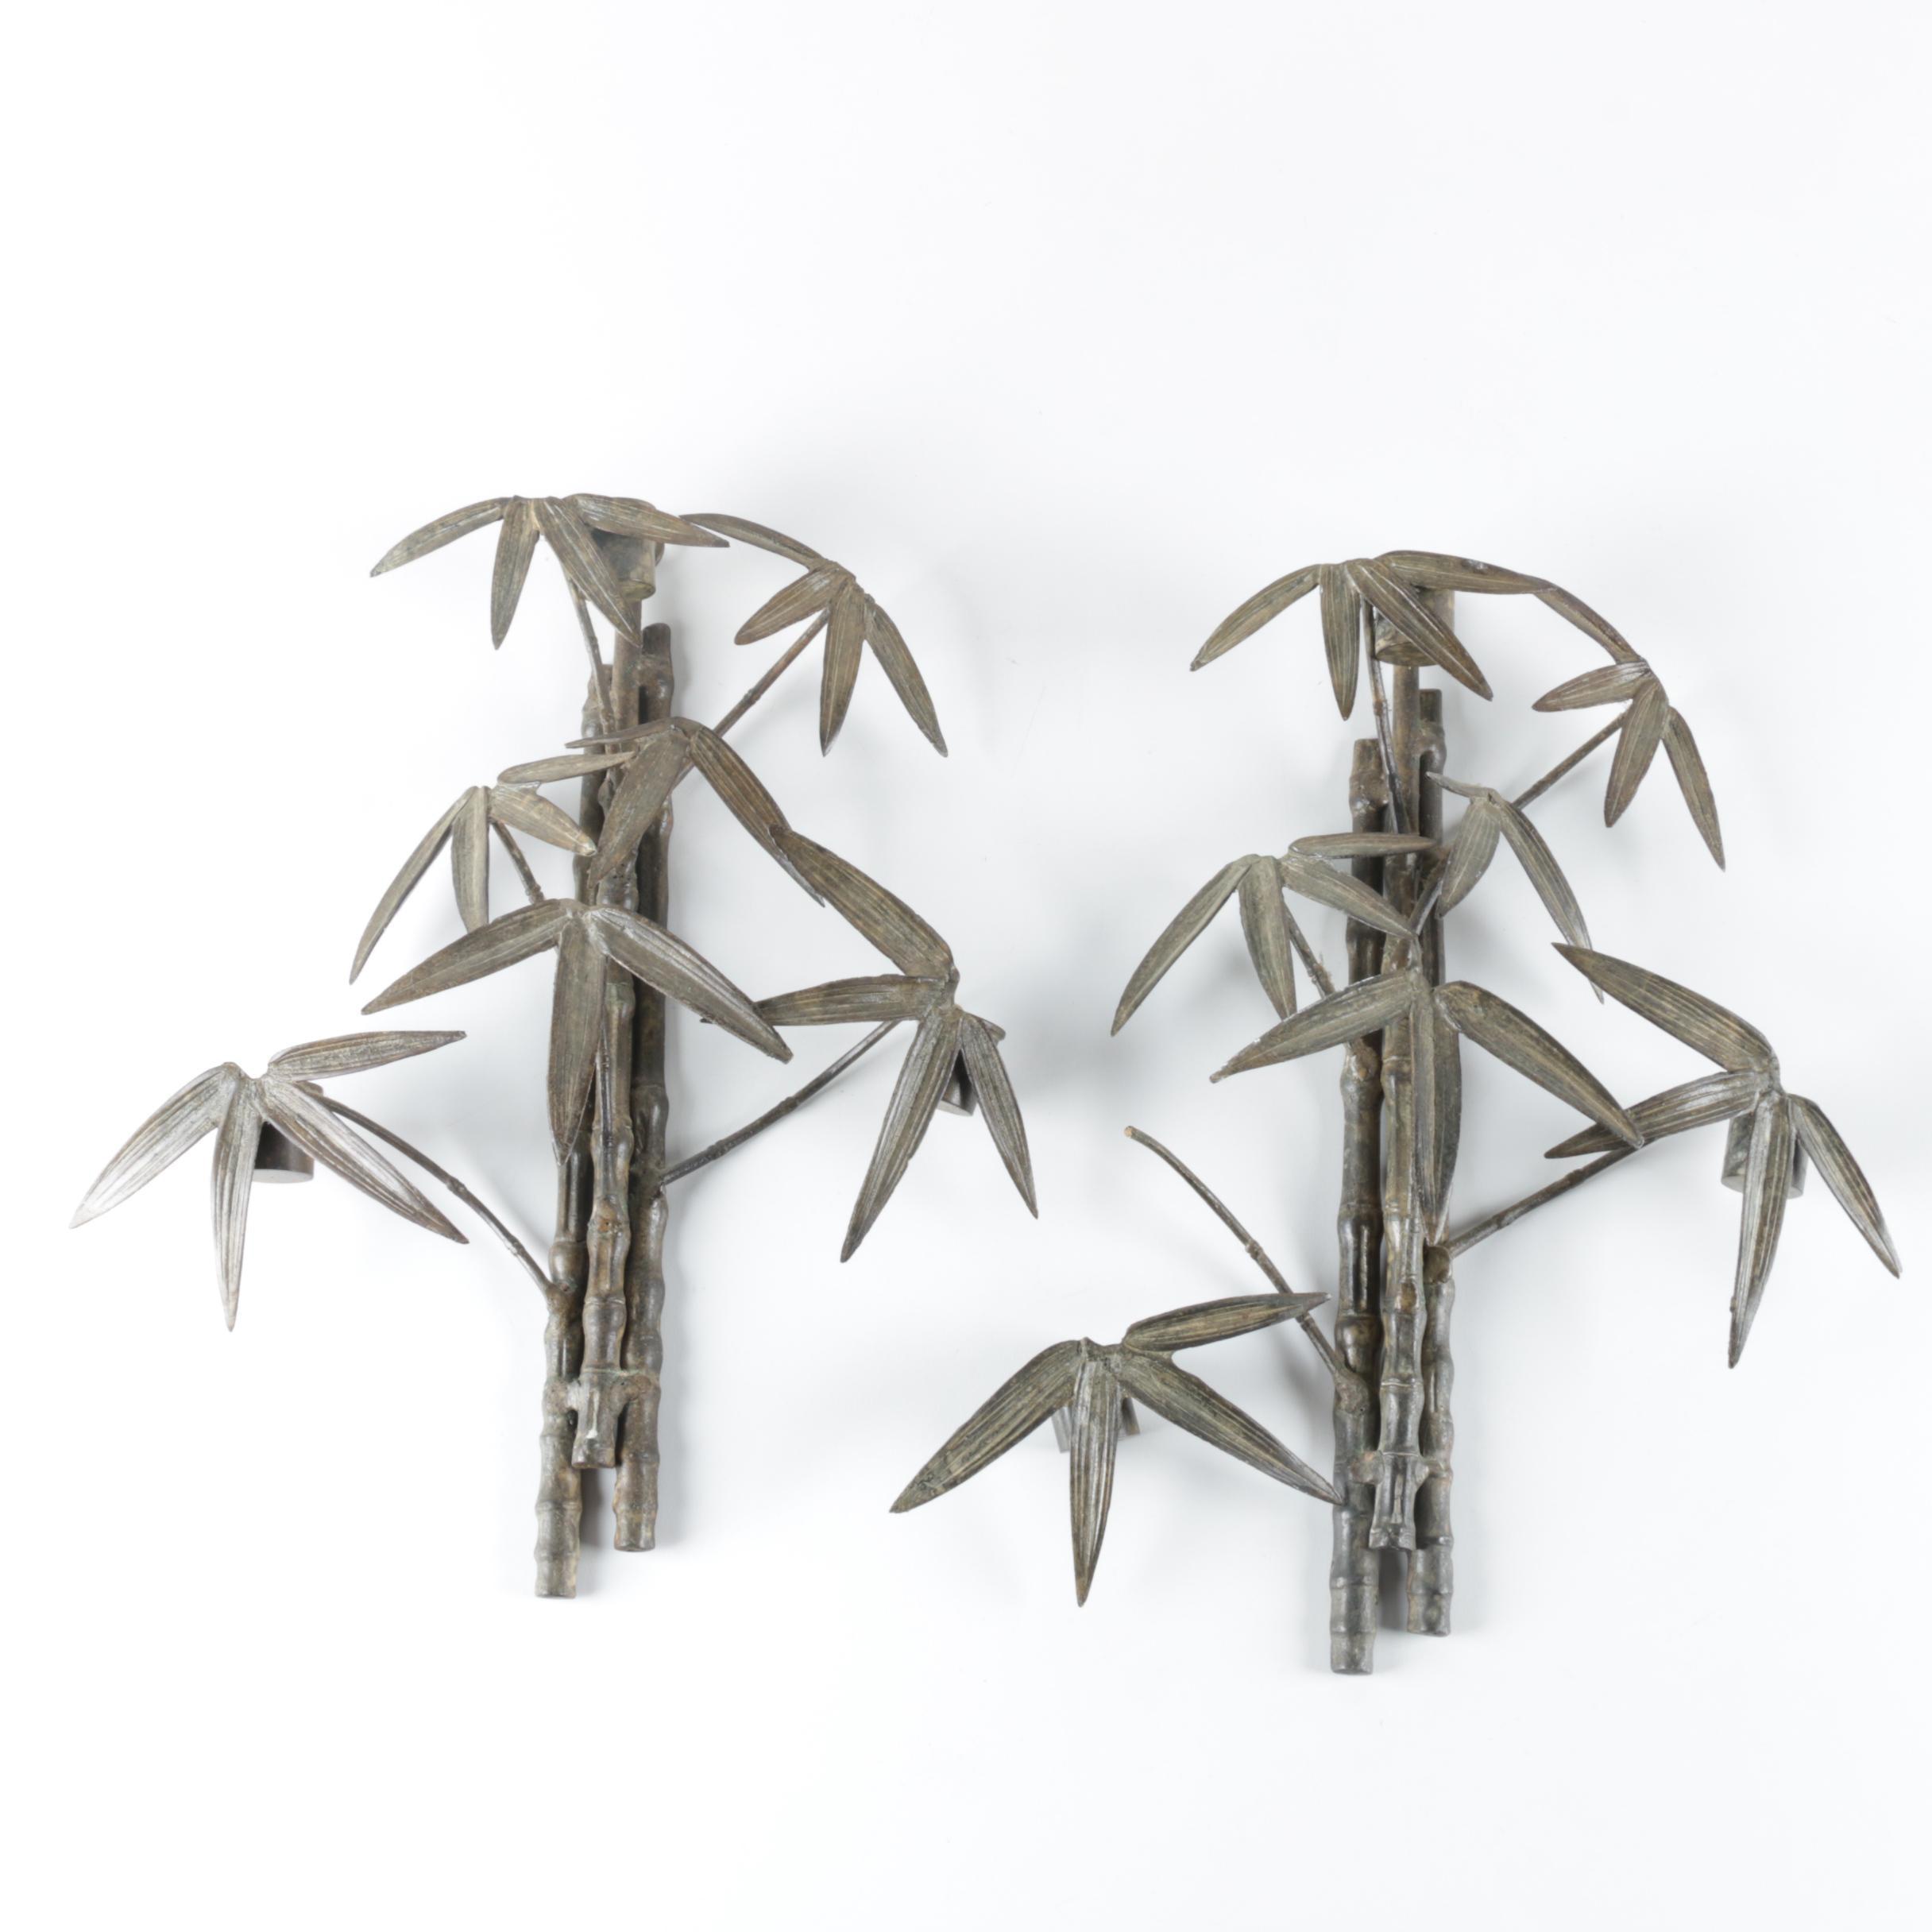 Pair of Metal Bamboo Motif Wall Mounted Candleholders